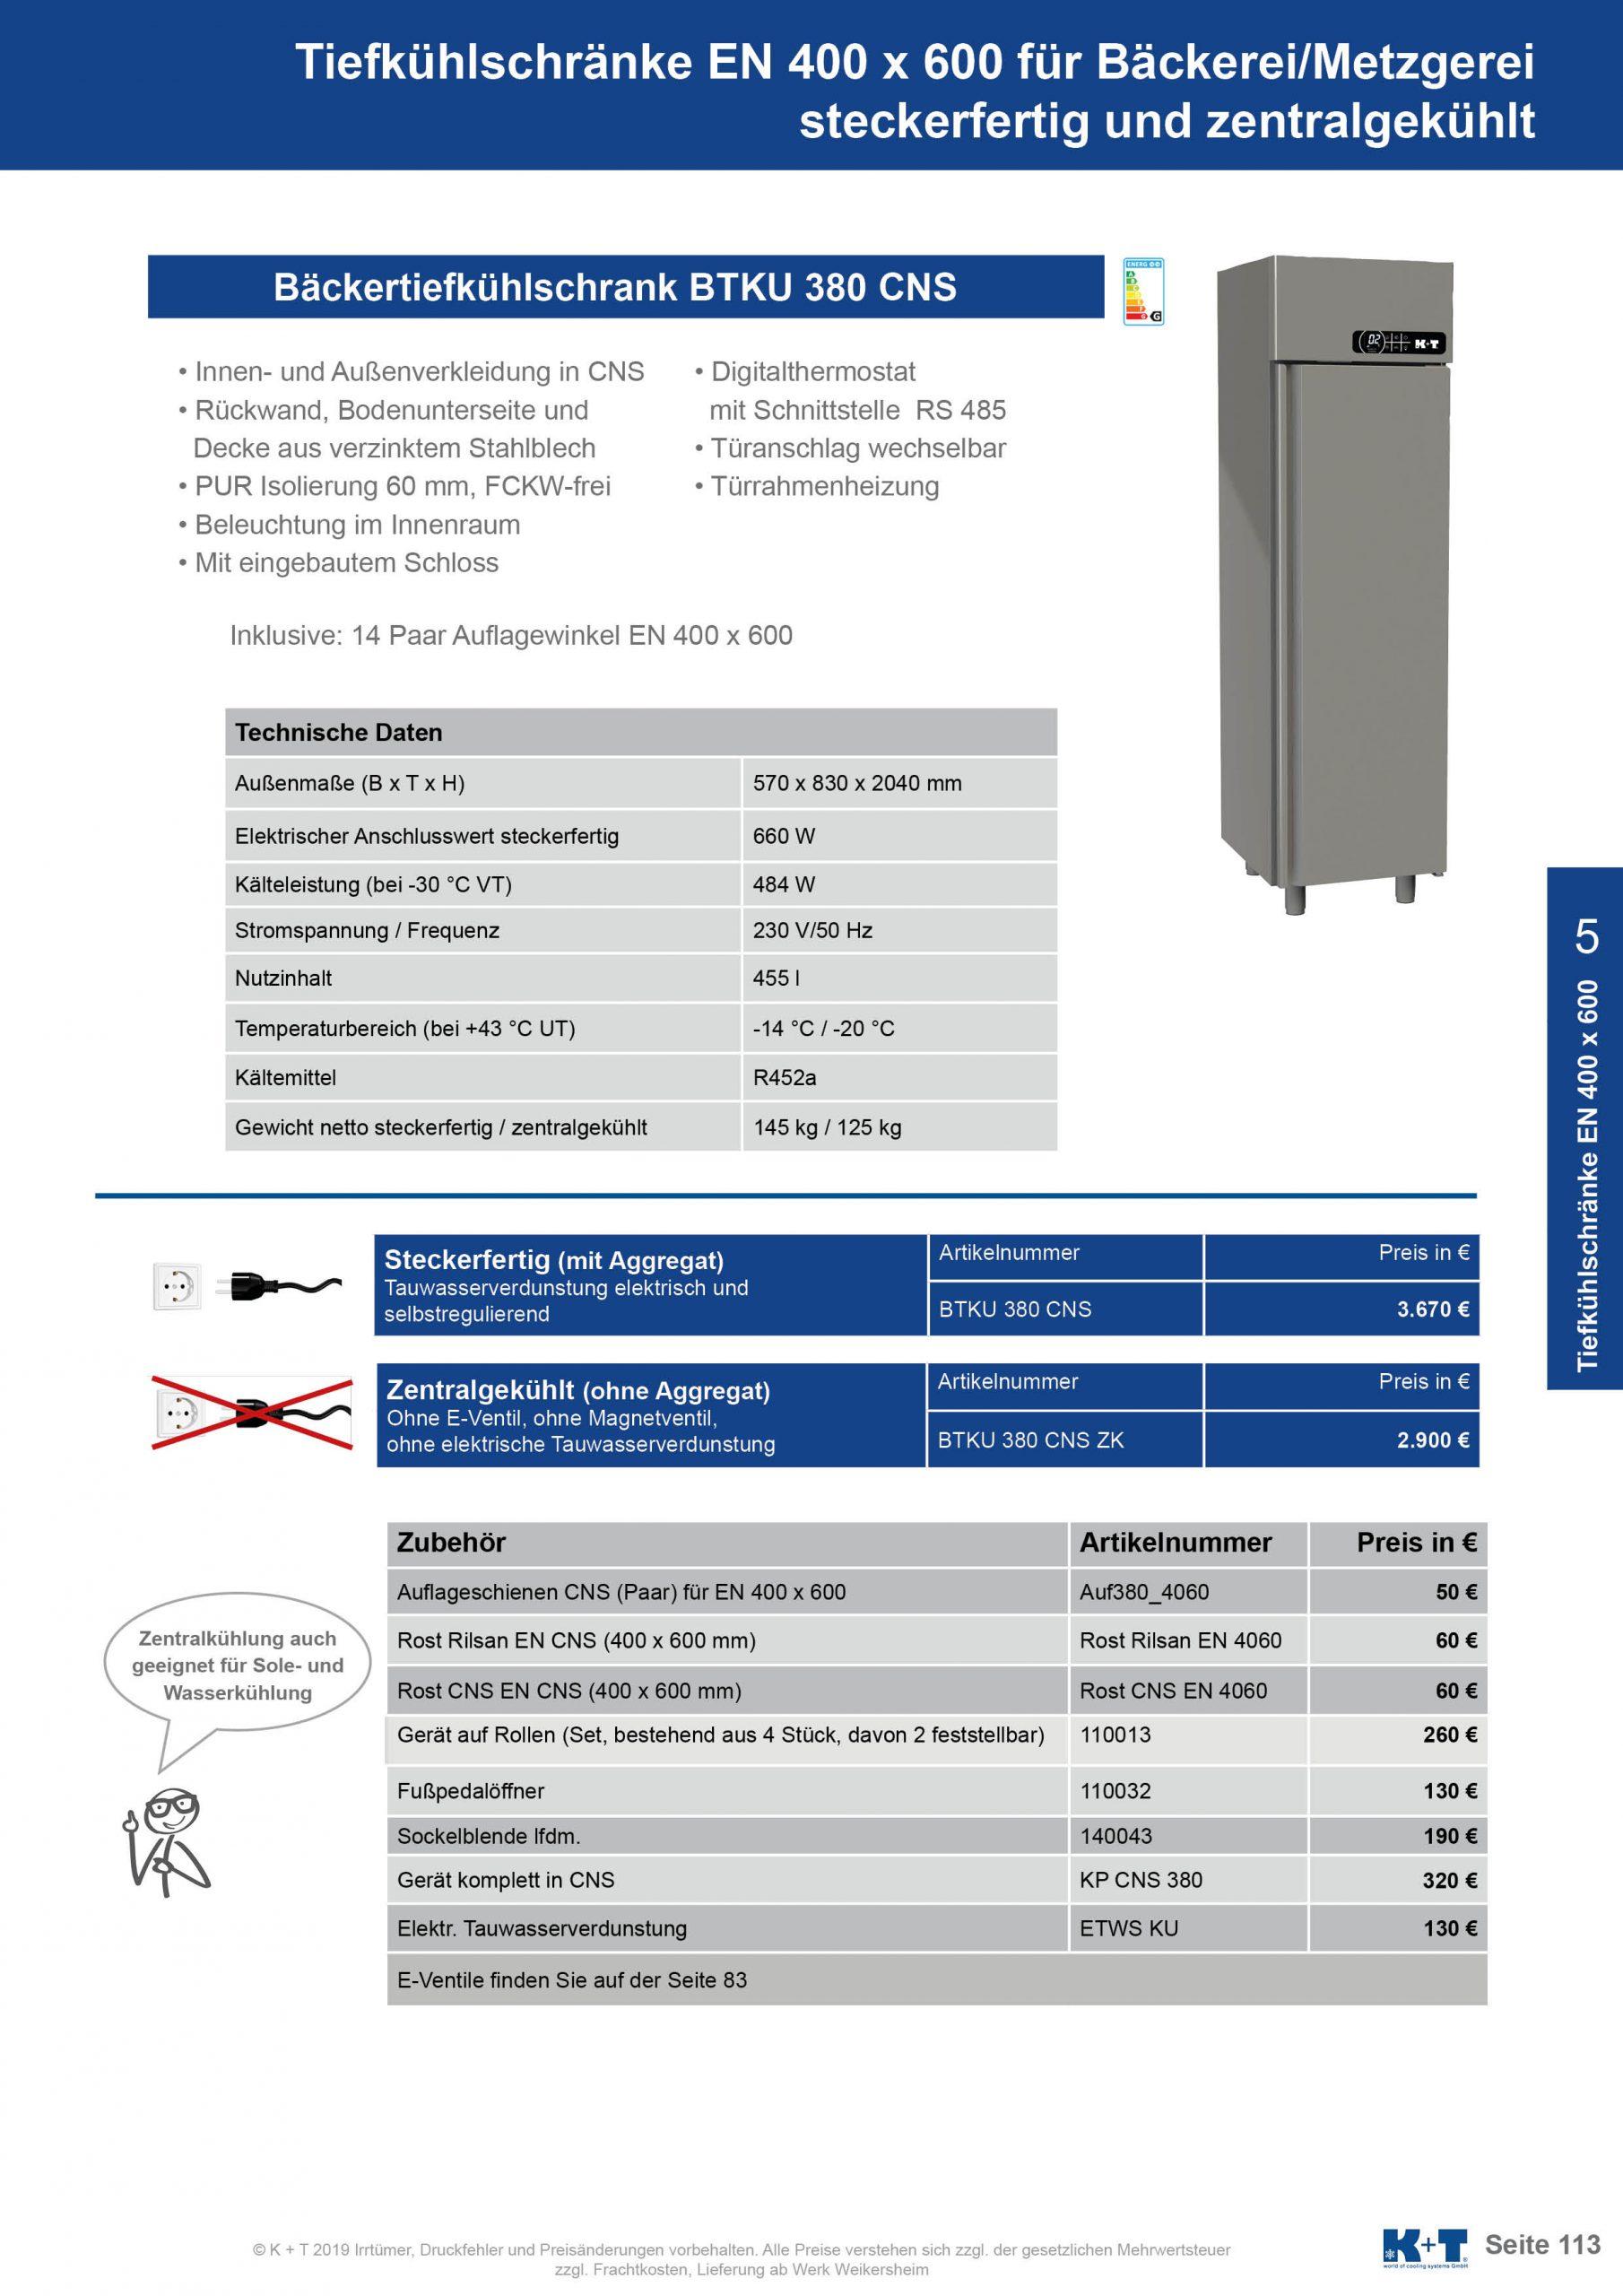 Tiefkühlschränke Euronorm 400 x 600 Tiefkühlschrank steckerfertig